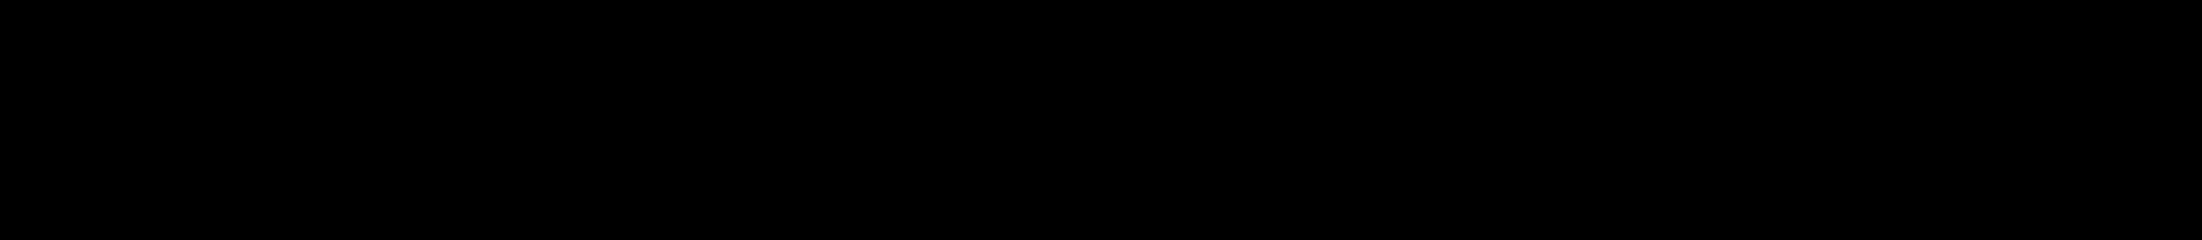 propagator-large-black (1).png